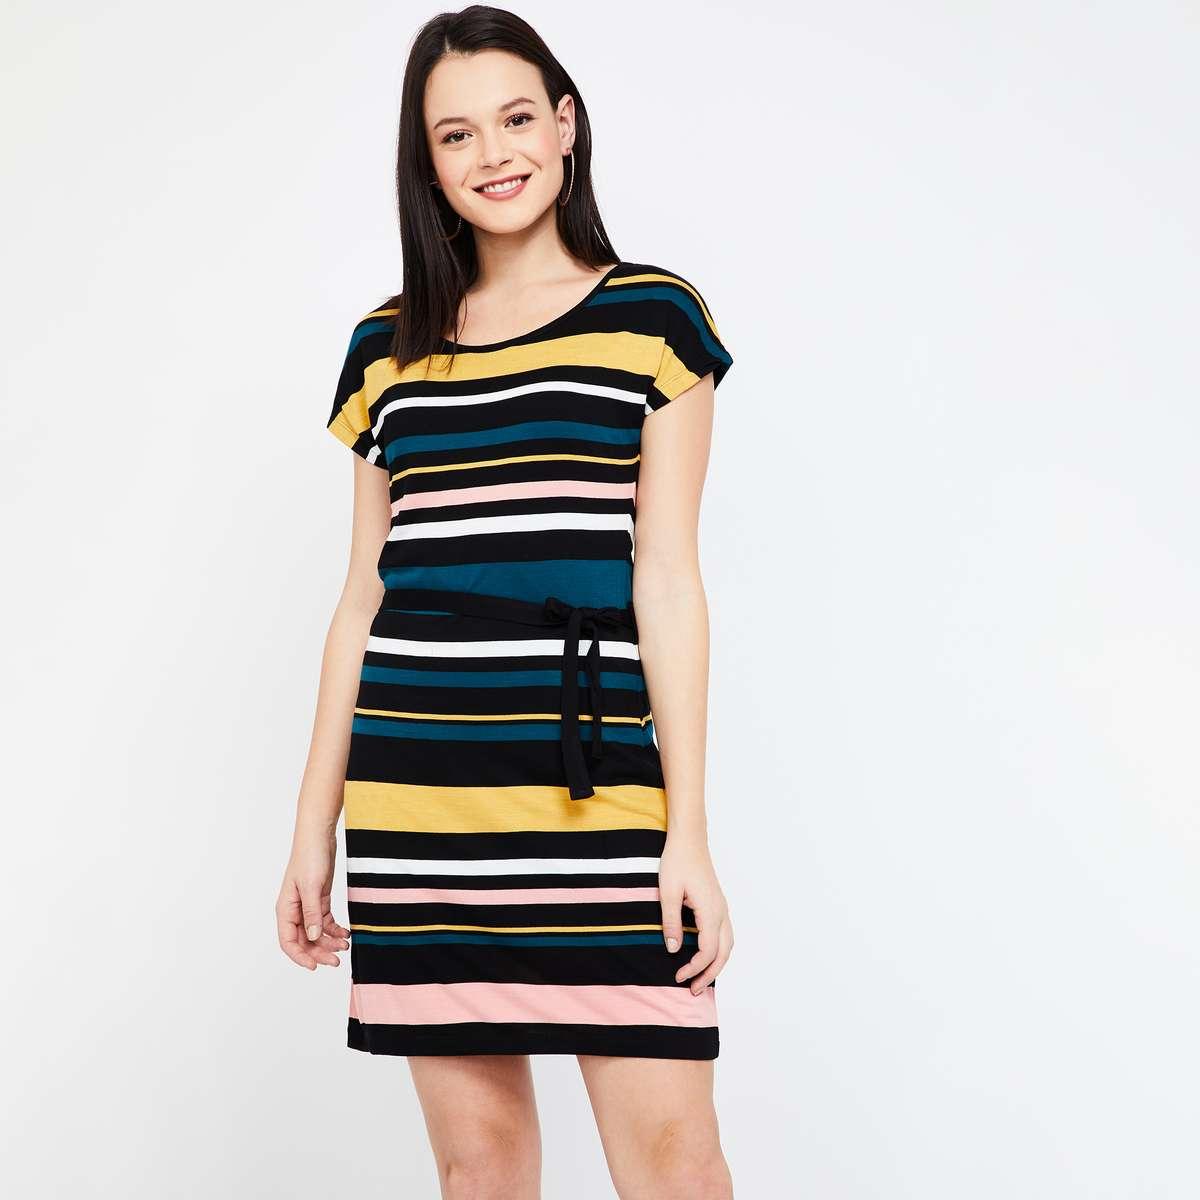 2.BOSSINI Striped Cap Sleeves Dress